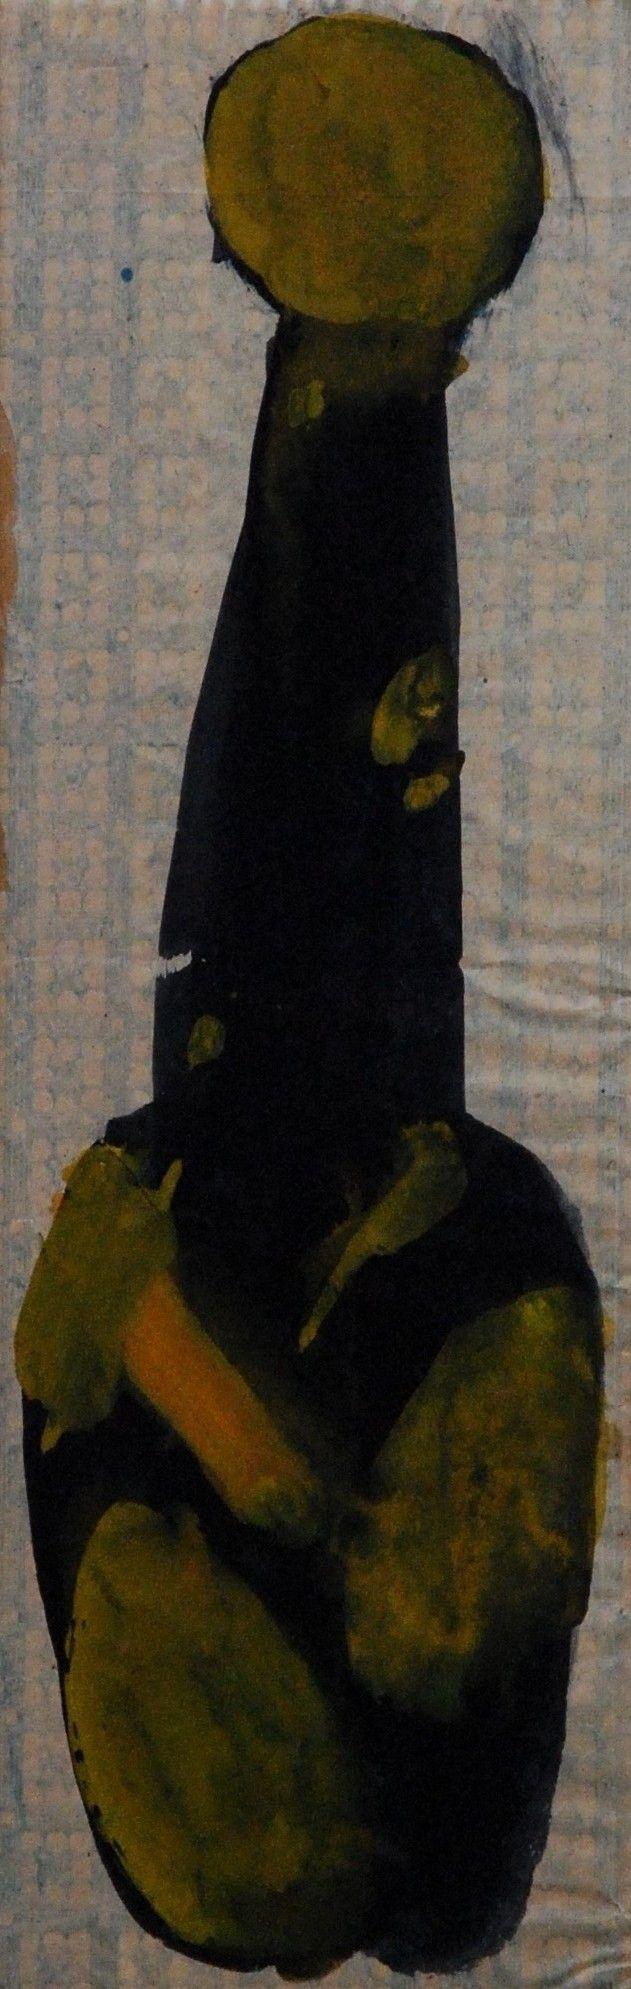 Lubomir Blecha, design for glass vase, 1960, aquarelle on paper, M: 39,5 x 13,0 cm, UMPRUM Prague